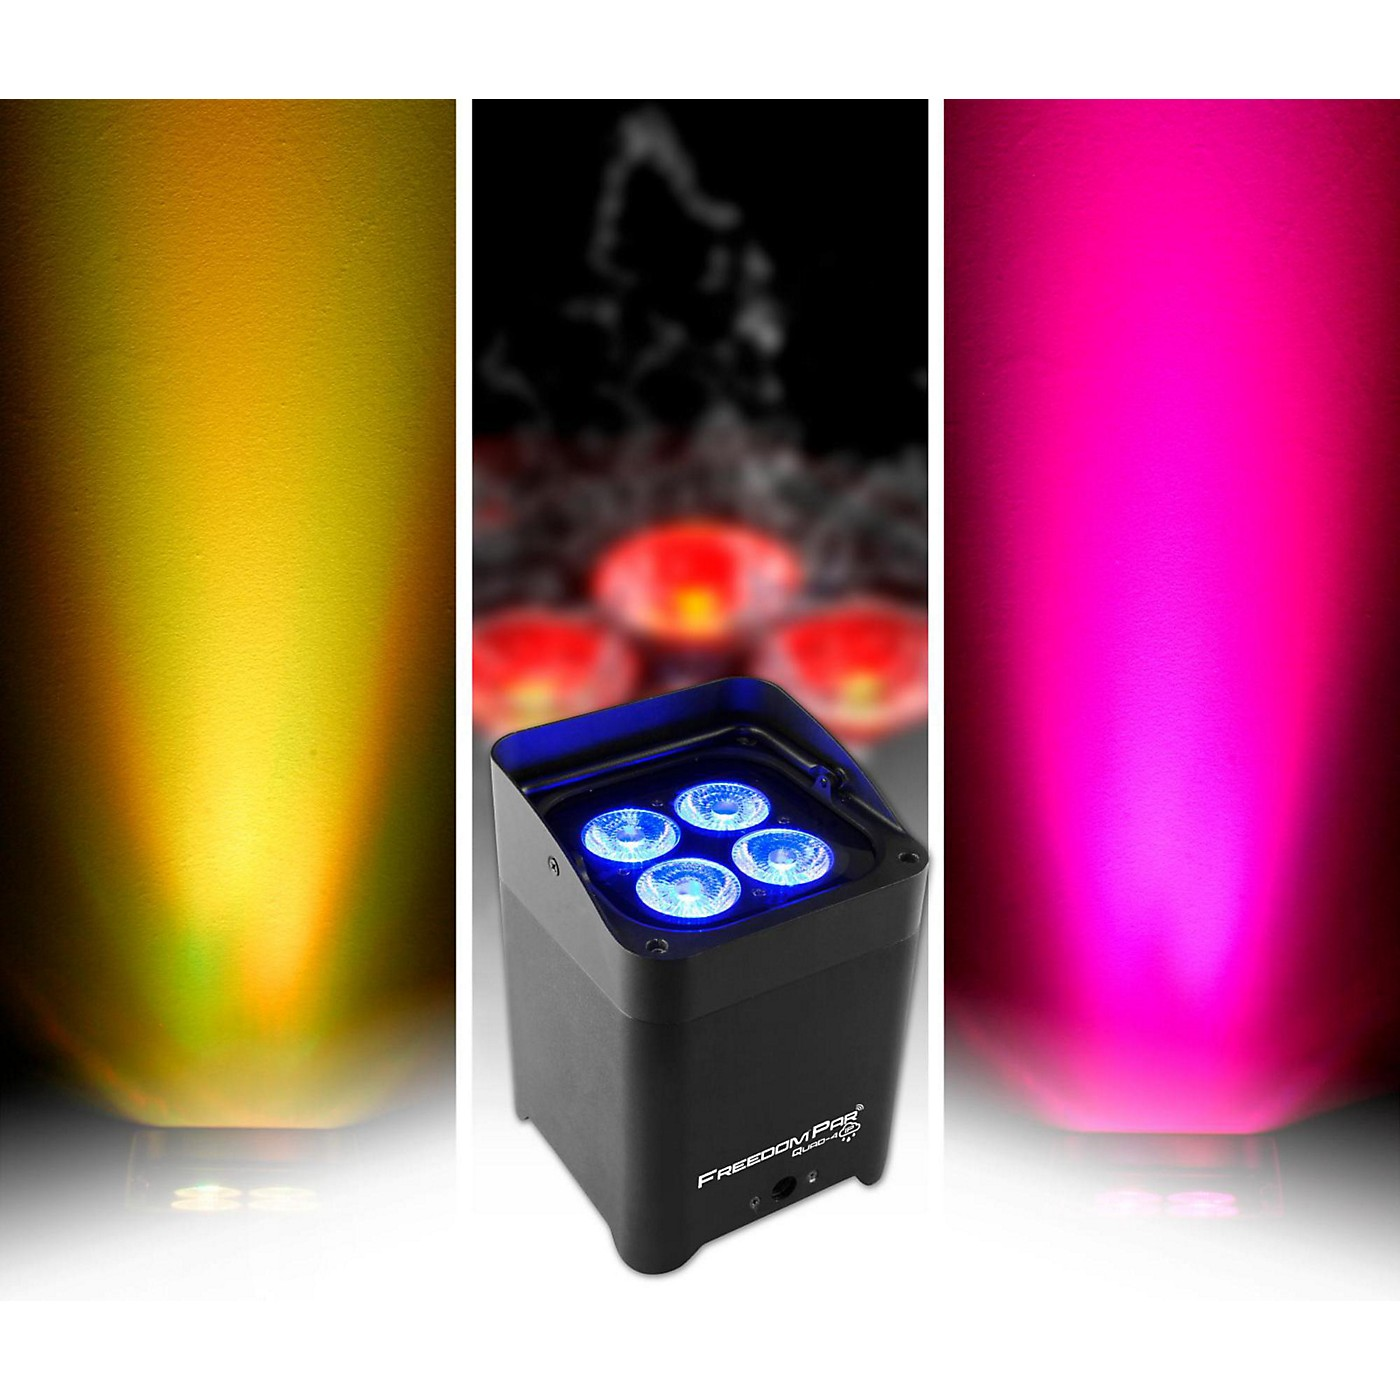 CHAUVET DJ Freedom Par Quad-4 IP Indoor/Outdoor Battery-Powered Wirelss LED Par-Style Wash Light thumbnail